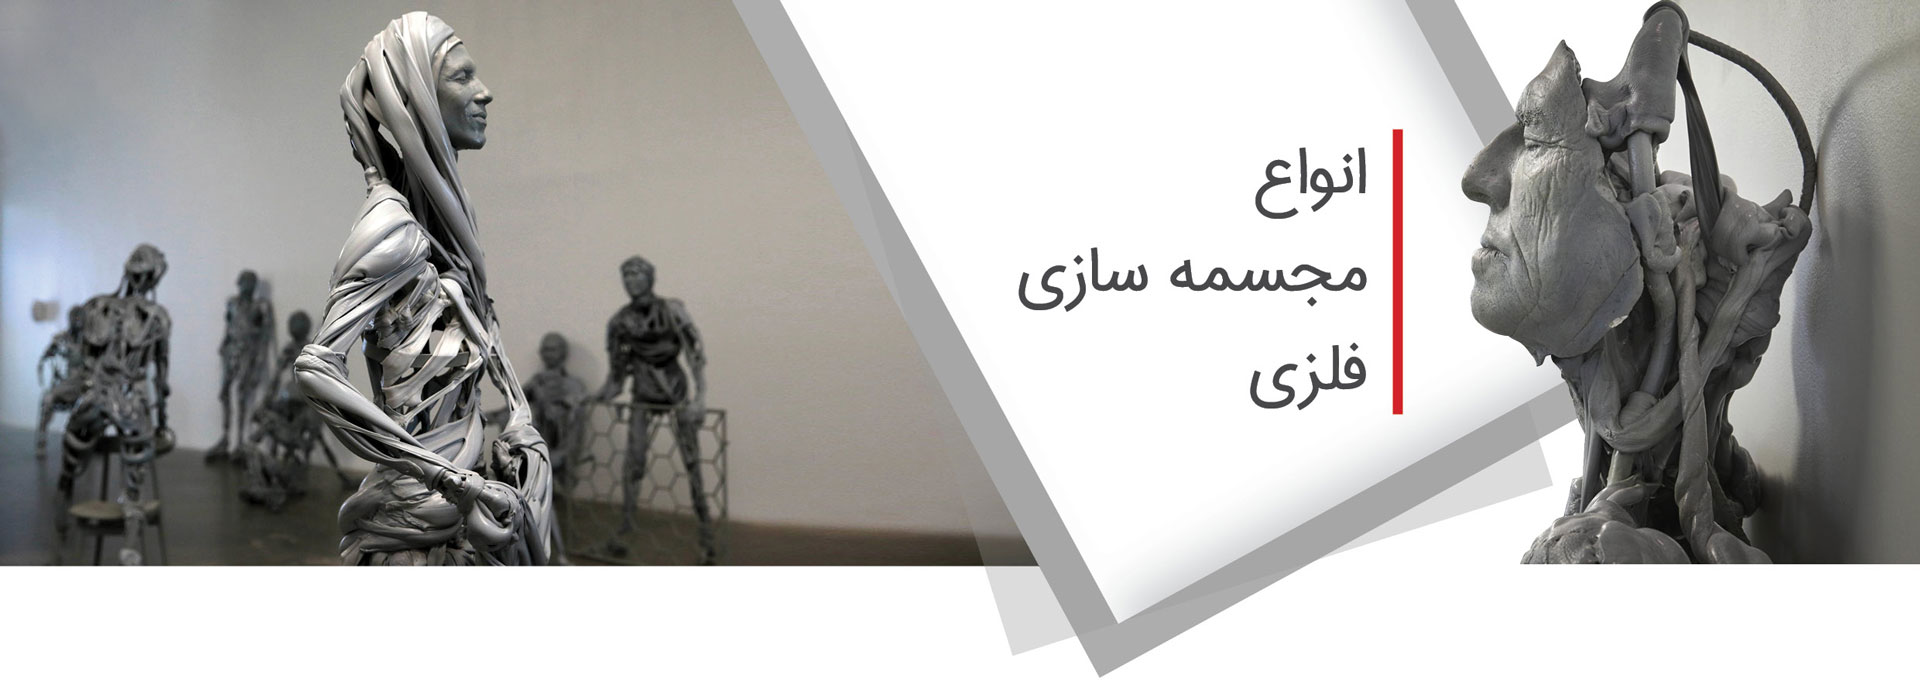 mojasame felezi 01 - انواع مجسمه سازی فلزی